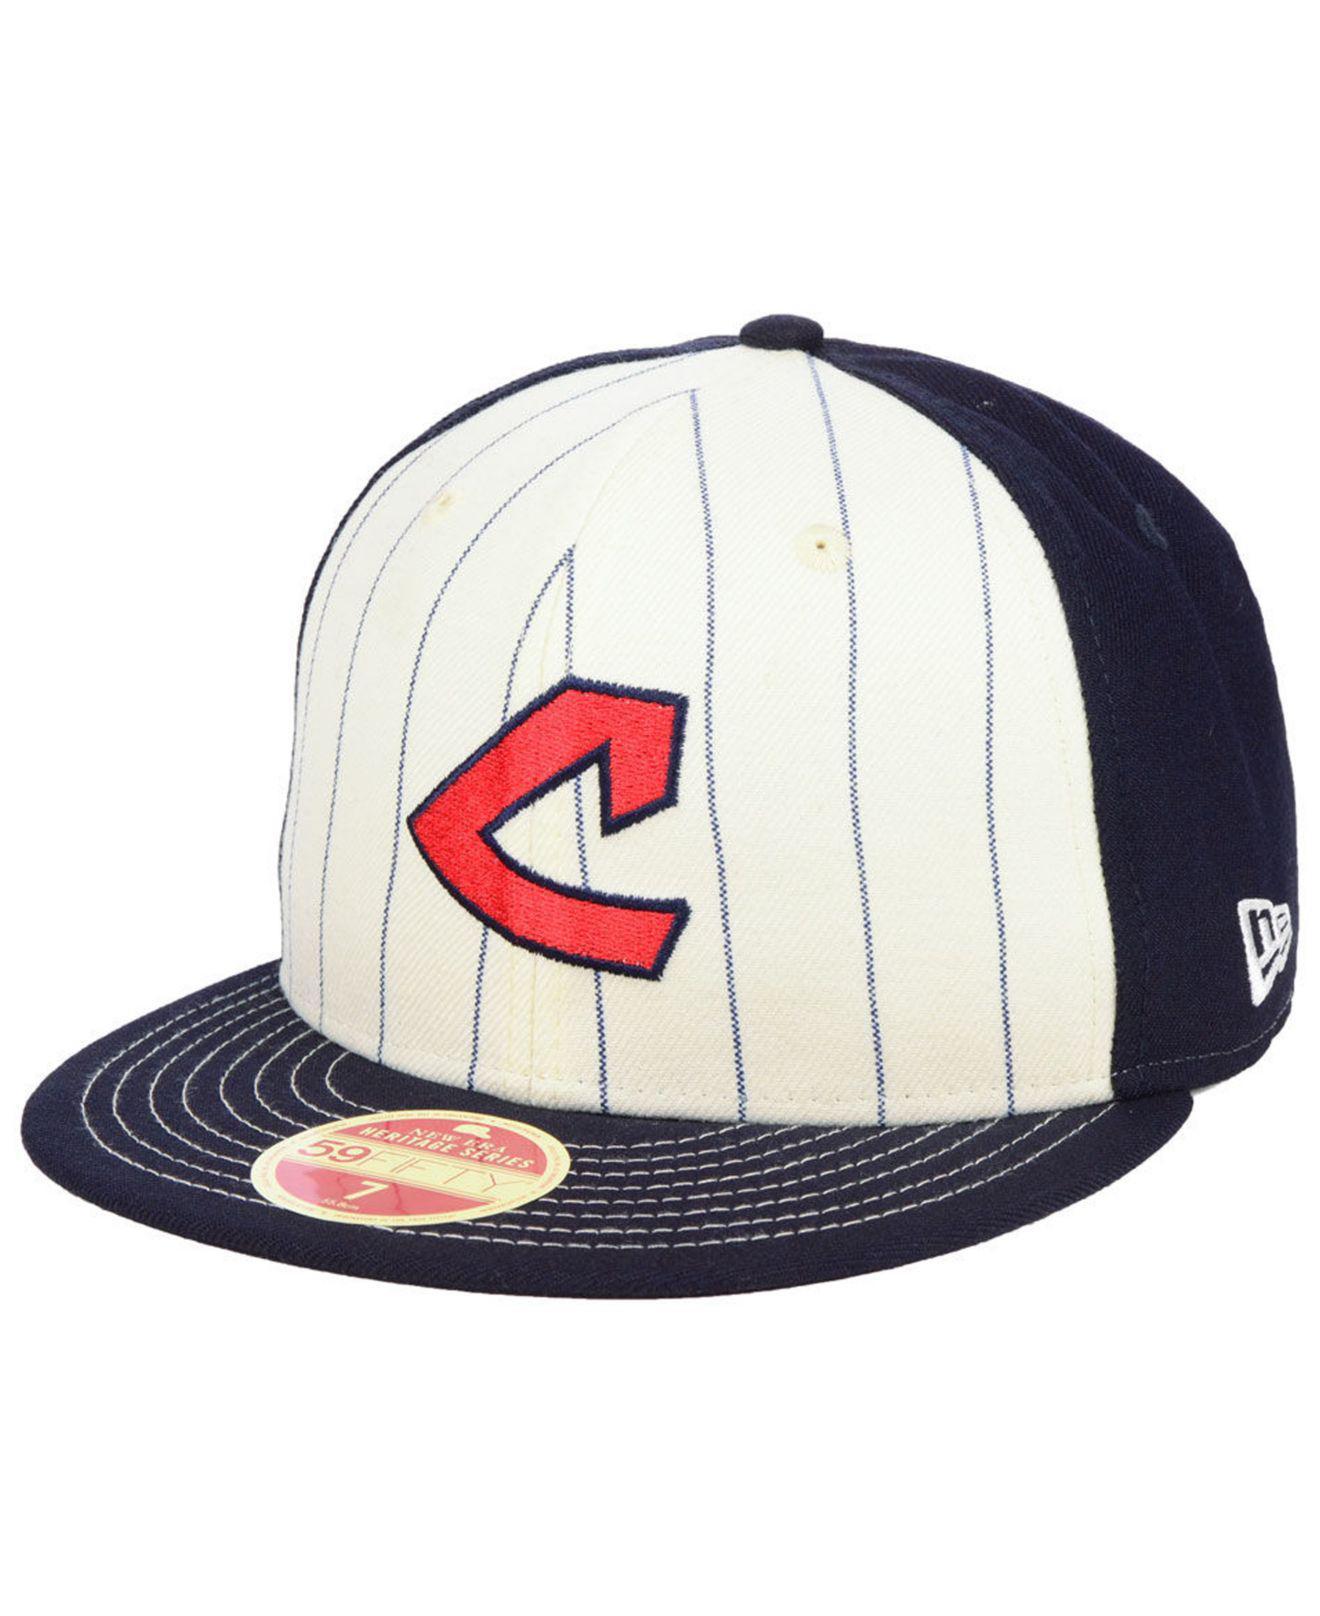 best website 66ef9 72ece ... clearance ktz. mens blue cleveland indians vintage front 59fifty fitted  cap 0534f 13484